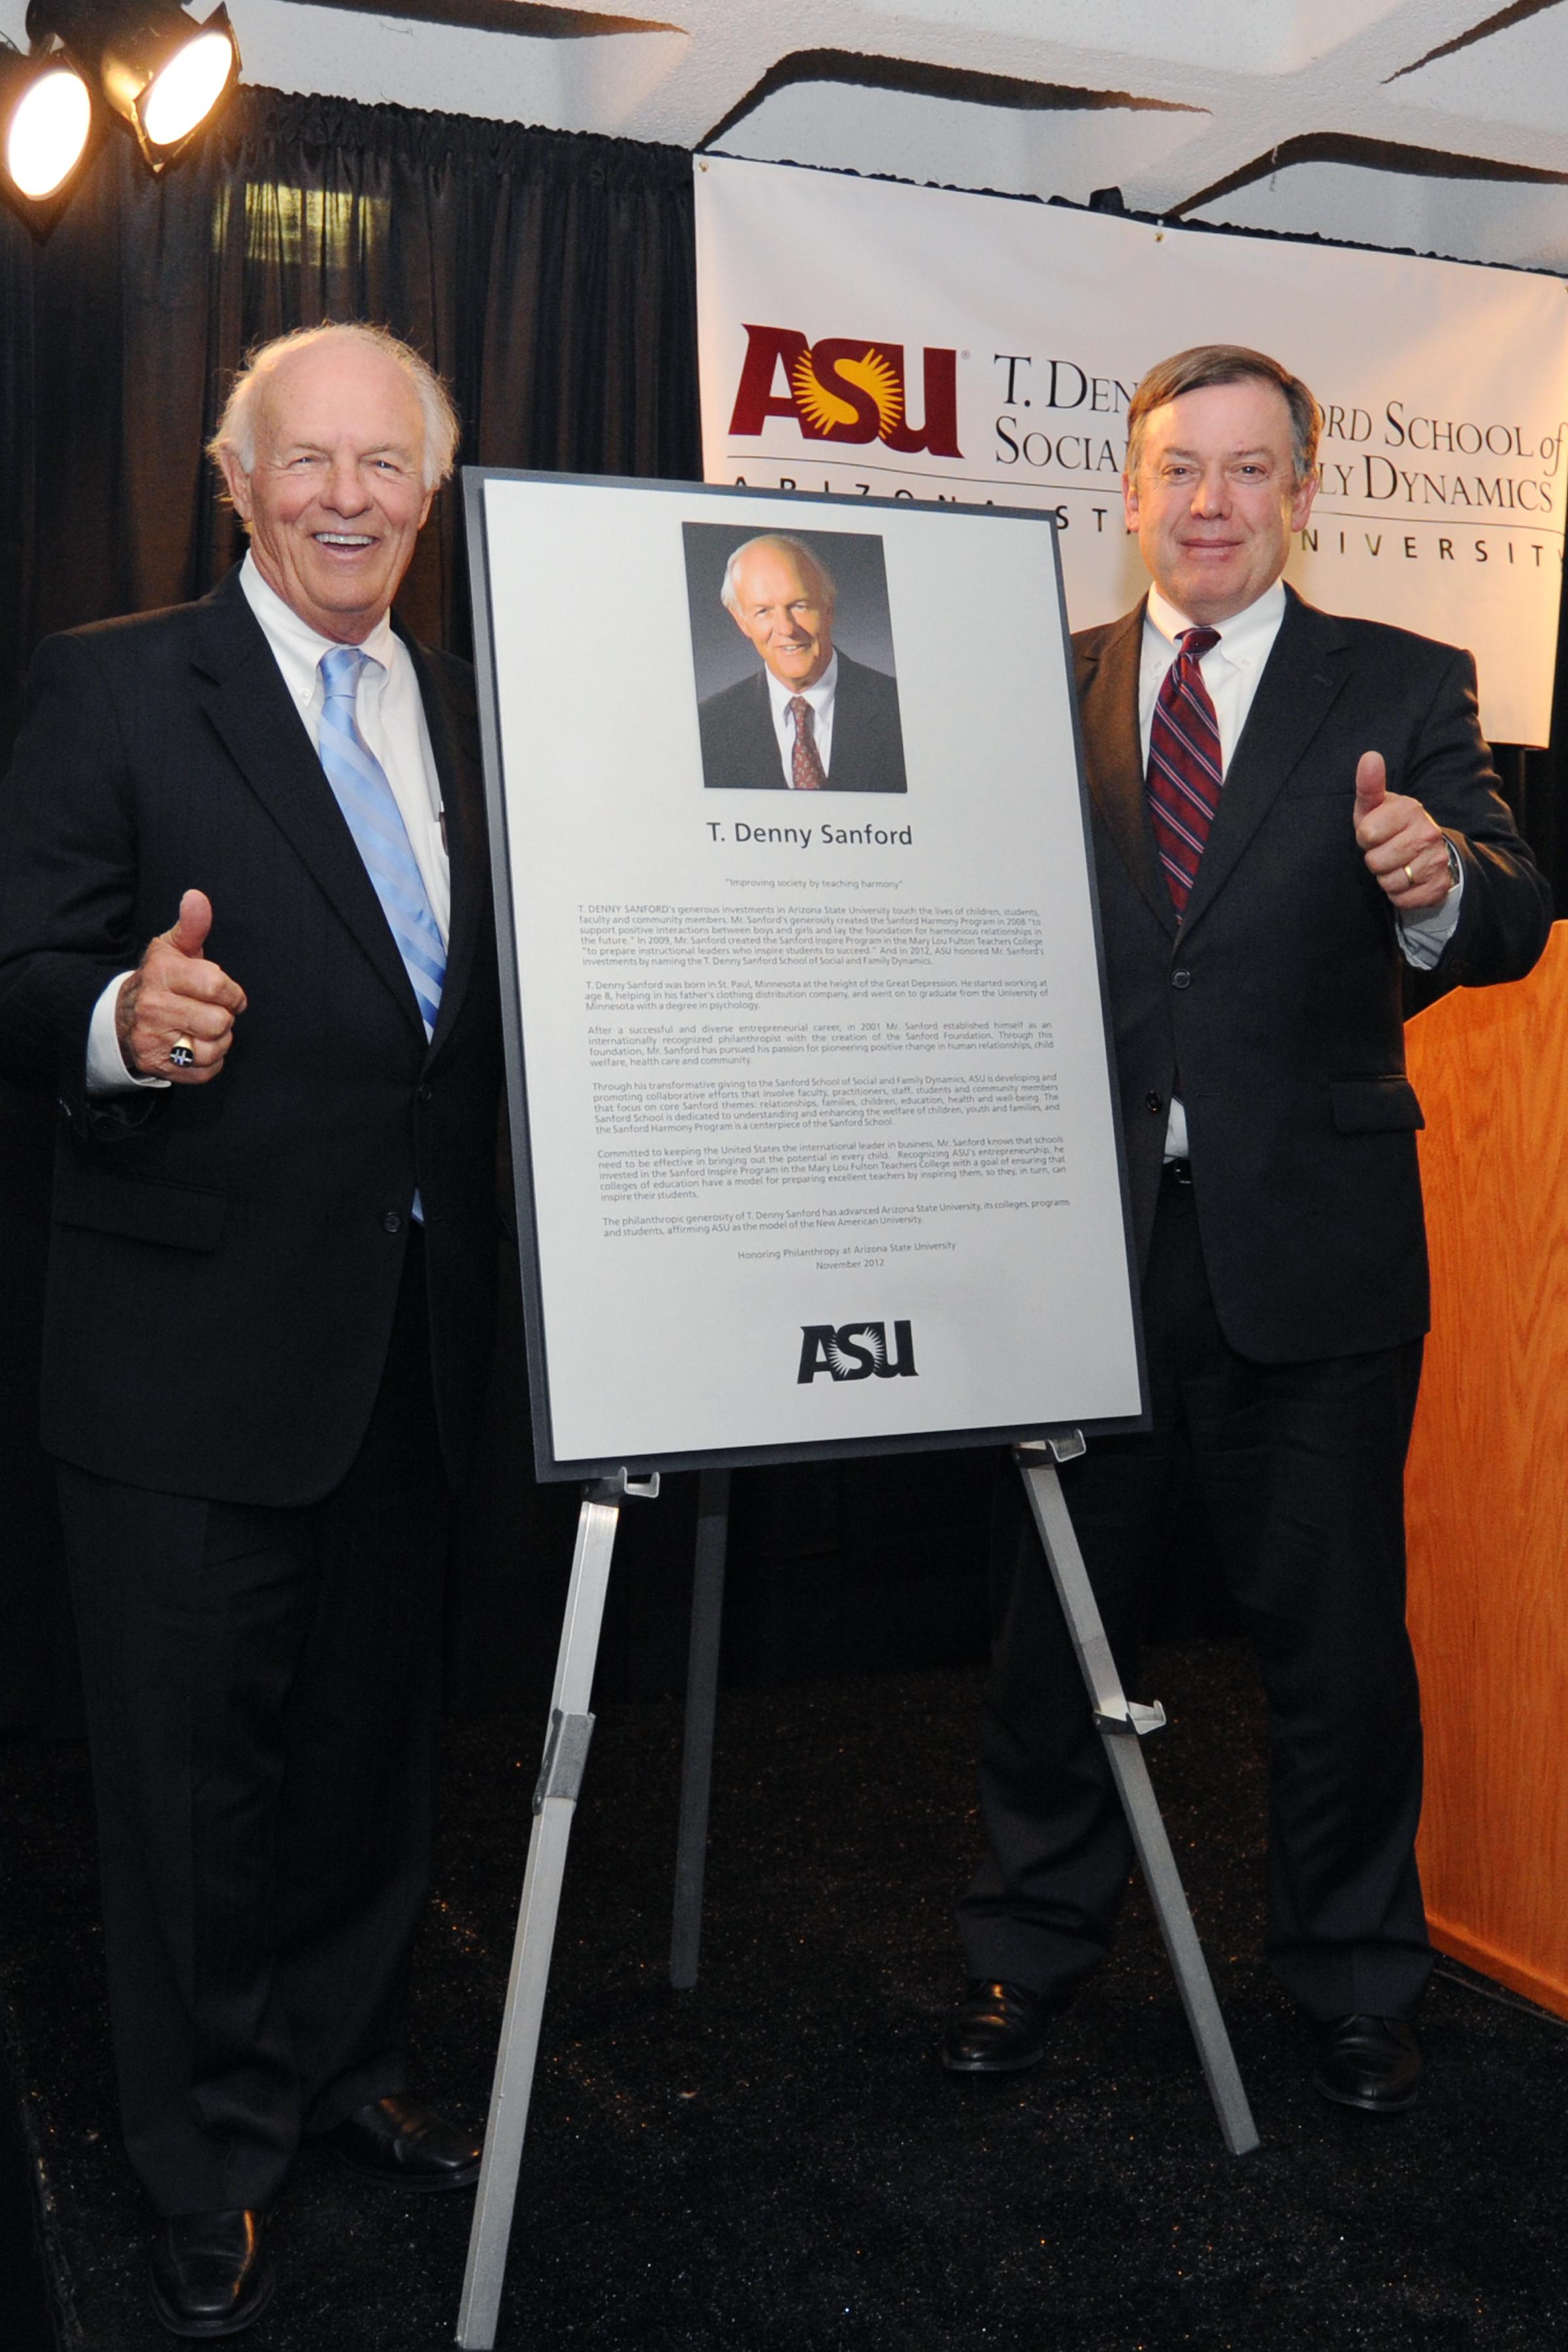 T. Denny Sanford has established the Horatio Alger-Denny Sanford Scholarship Program at 12 universities, including ASU